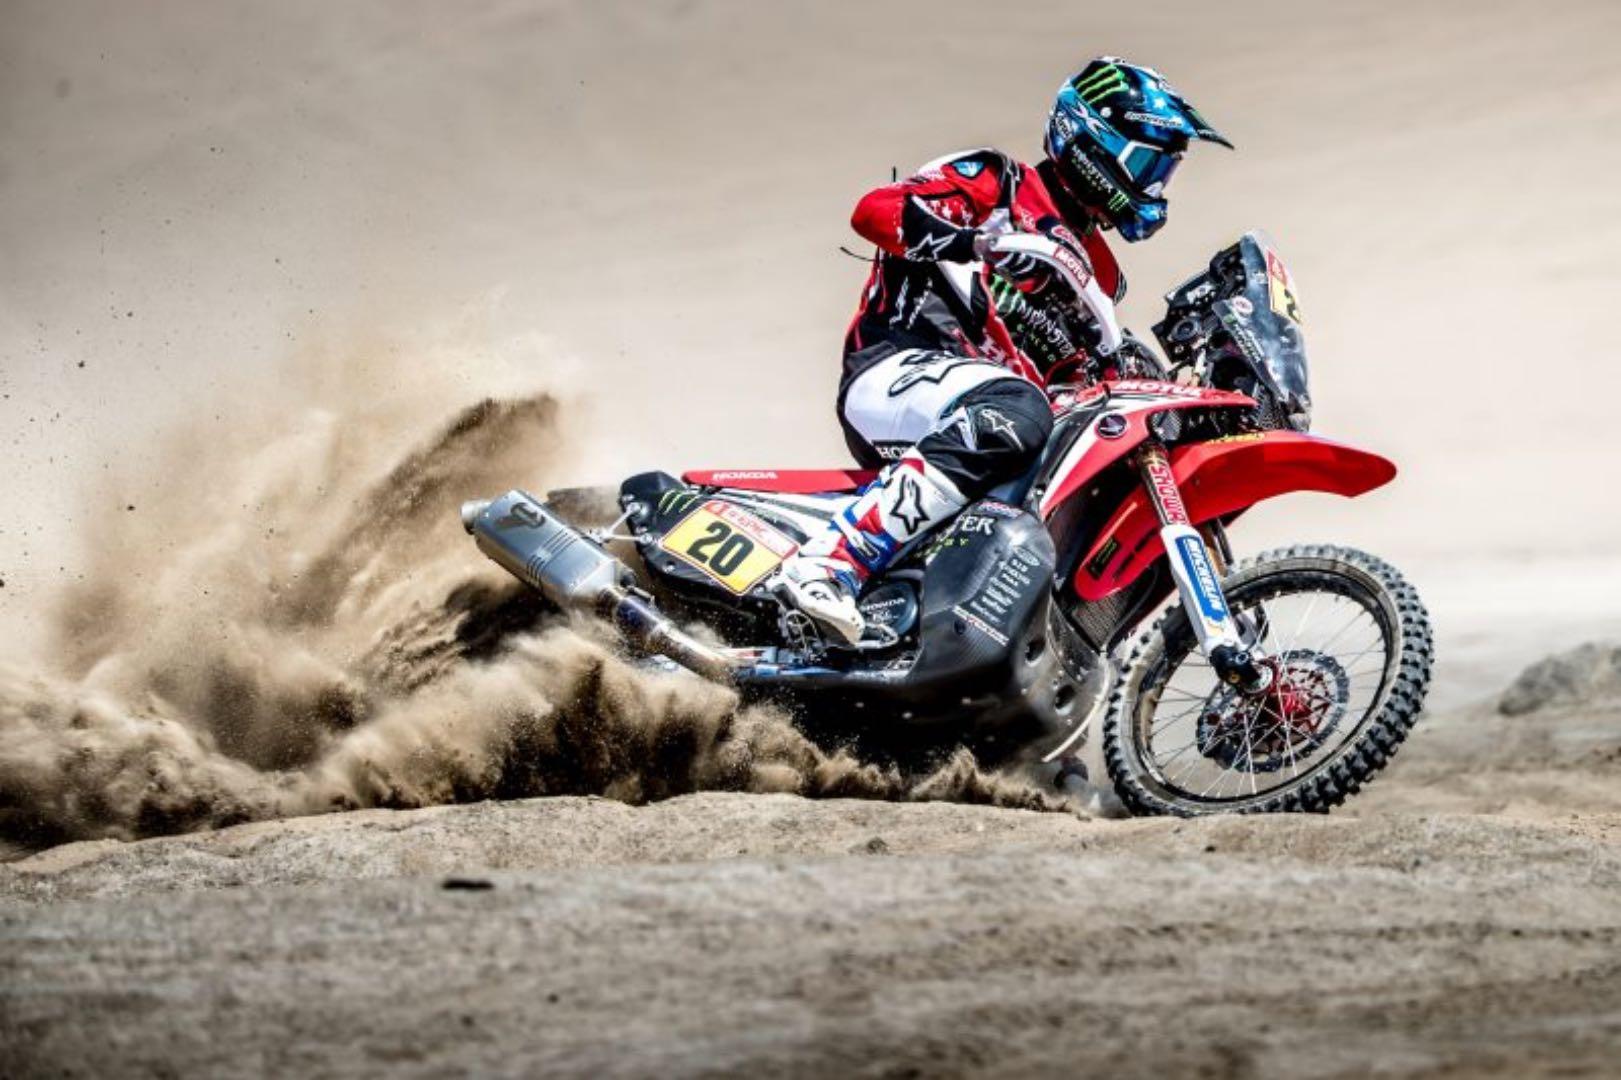 2018 Dakar Rally Motorcycle Preview: Honda's Ricky Brabec